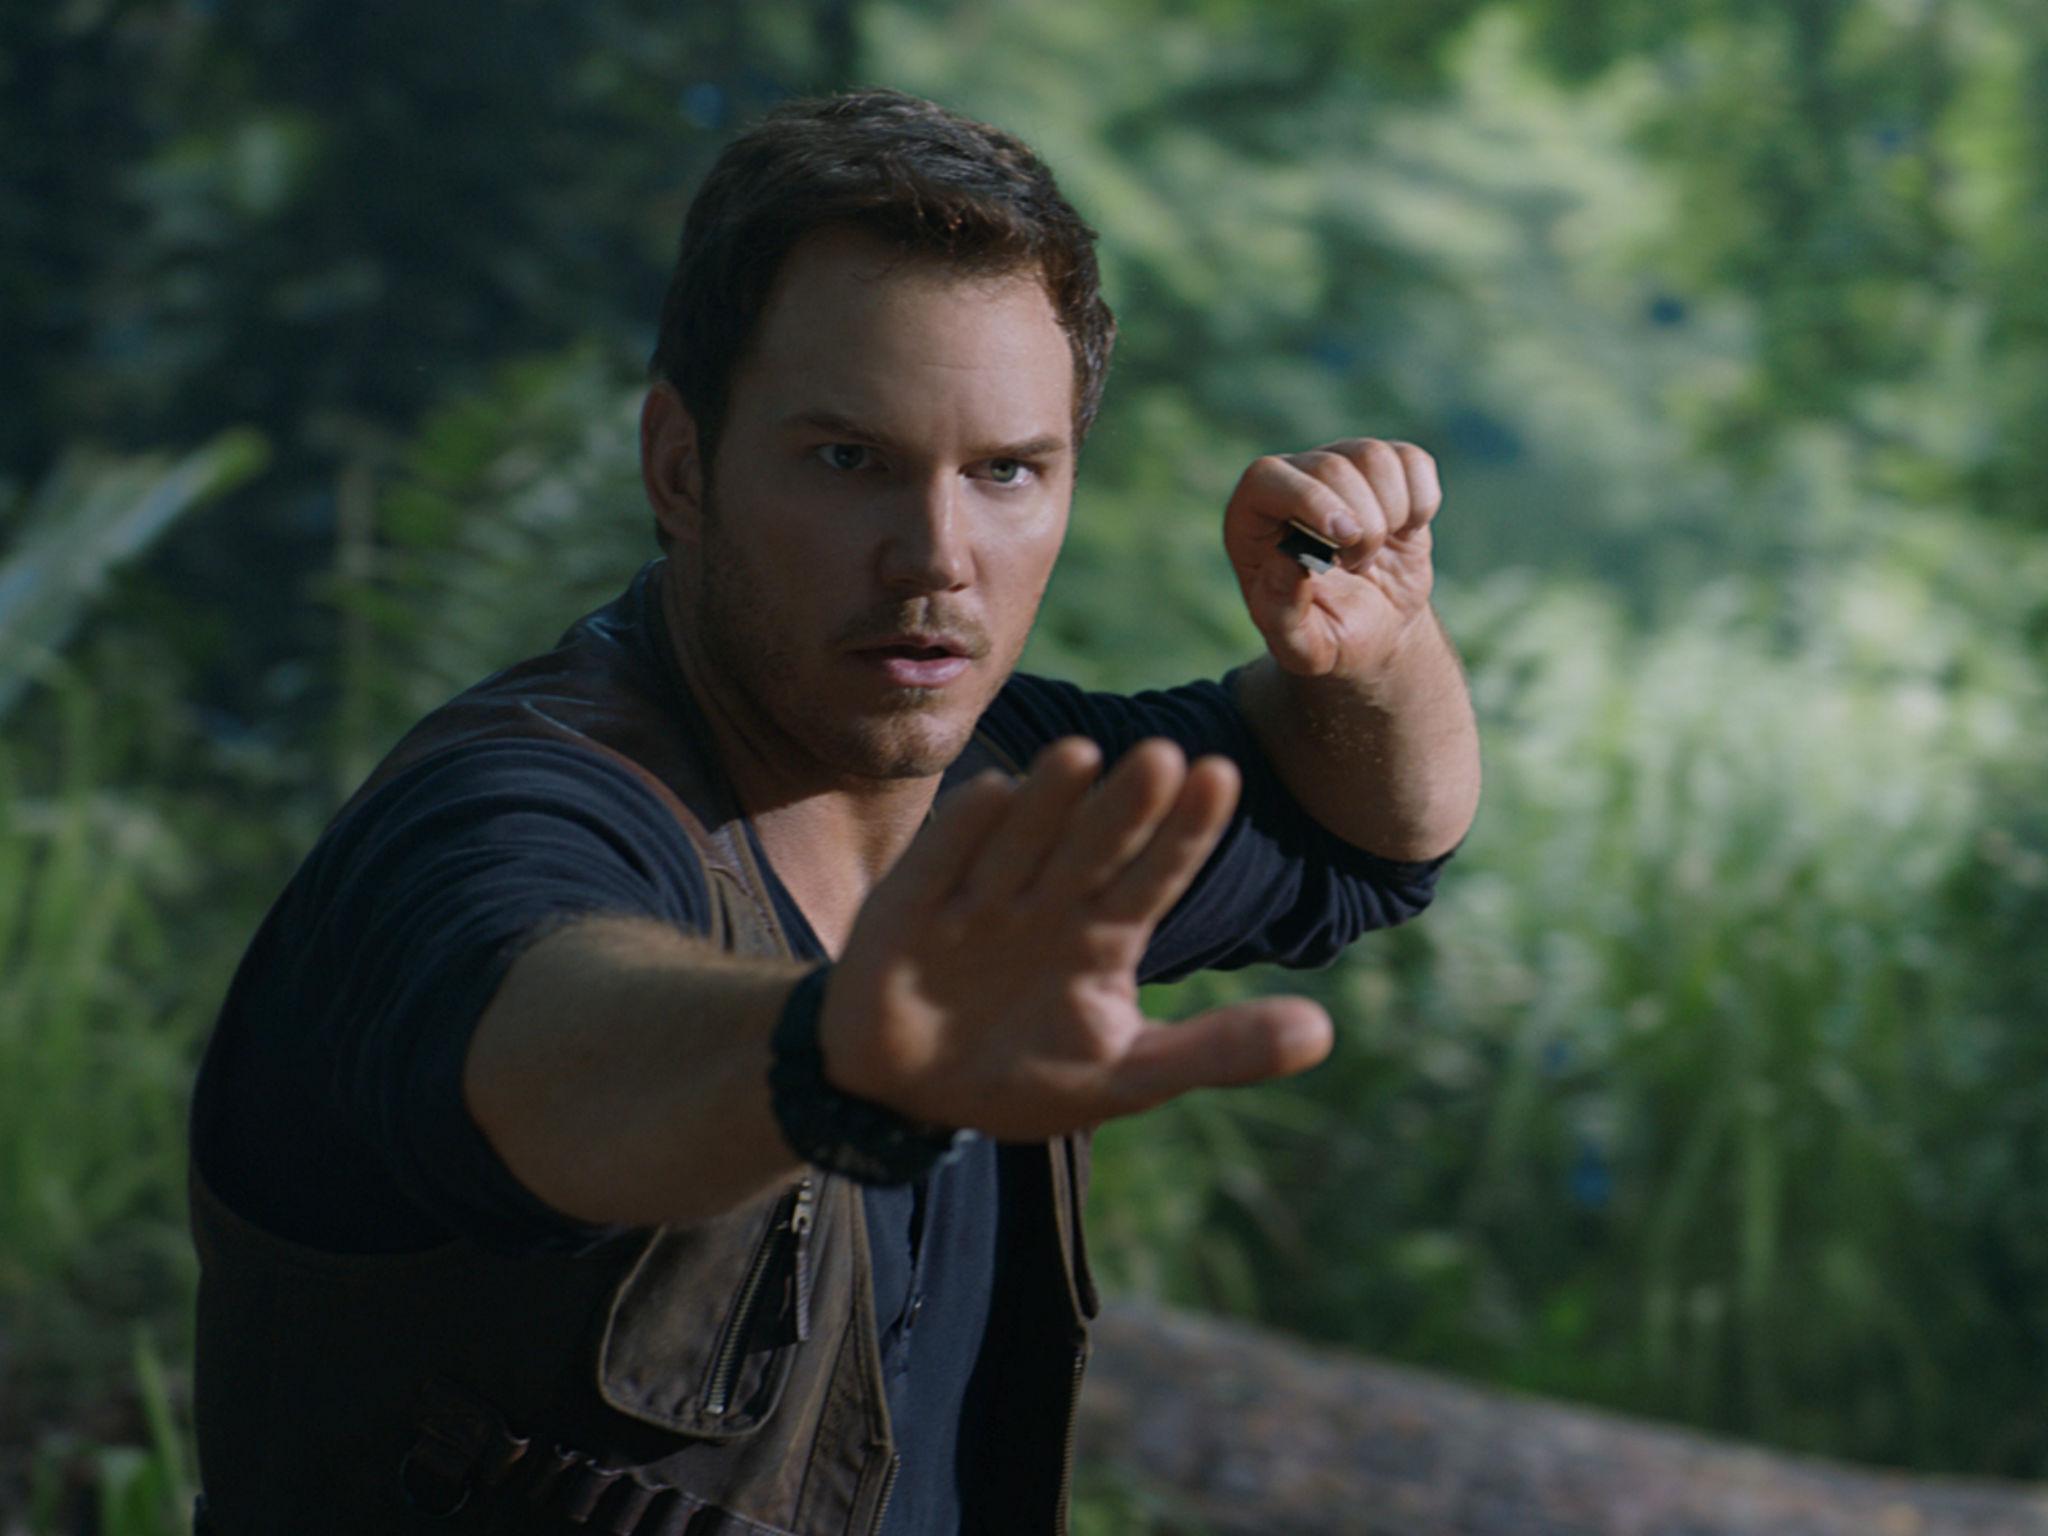 Jurassic World Fallen Kingdom Review Chris Pratt as Owen Grady